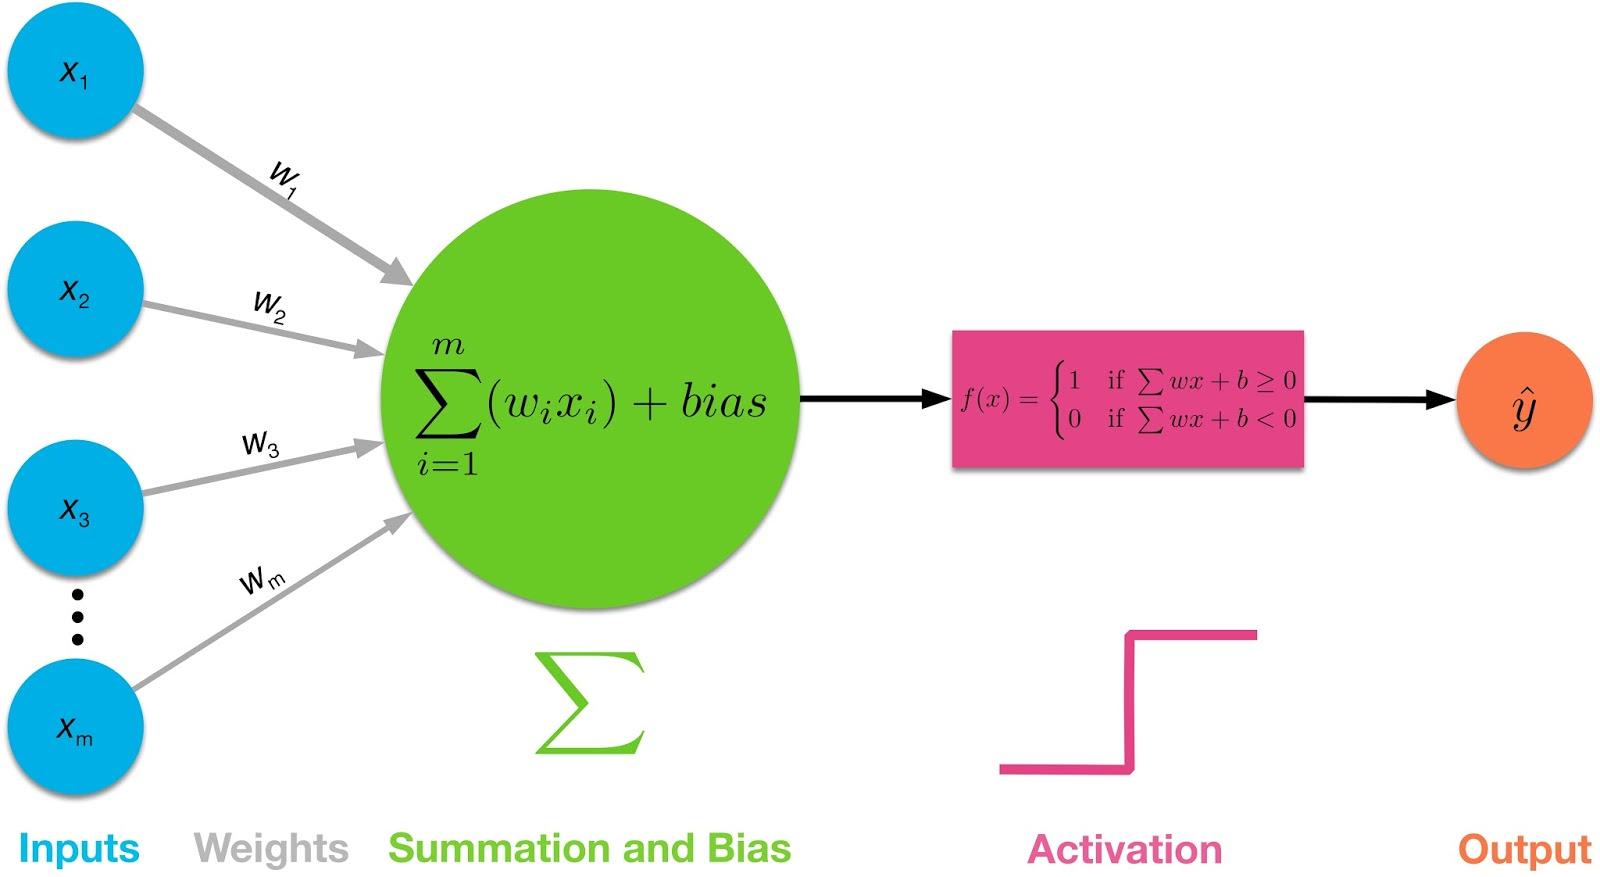 Figure. Activation Function